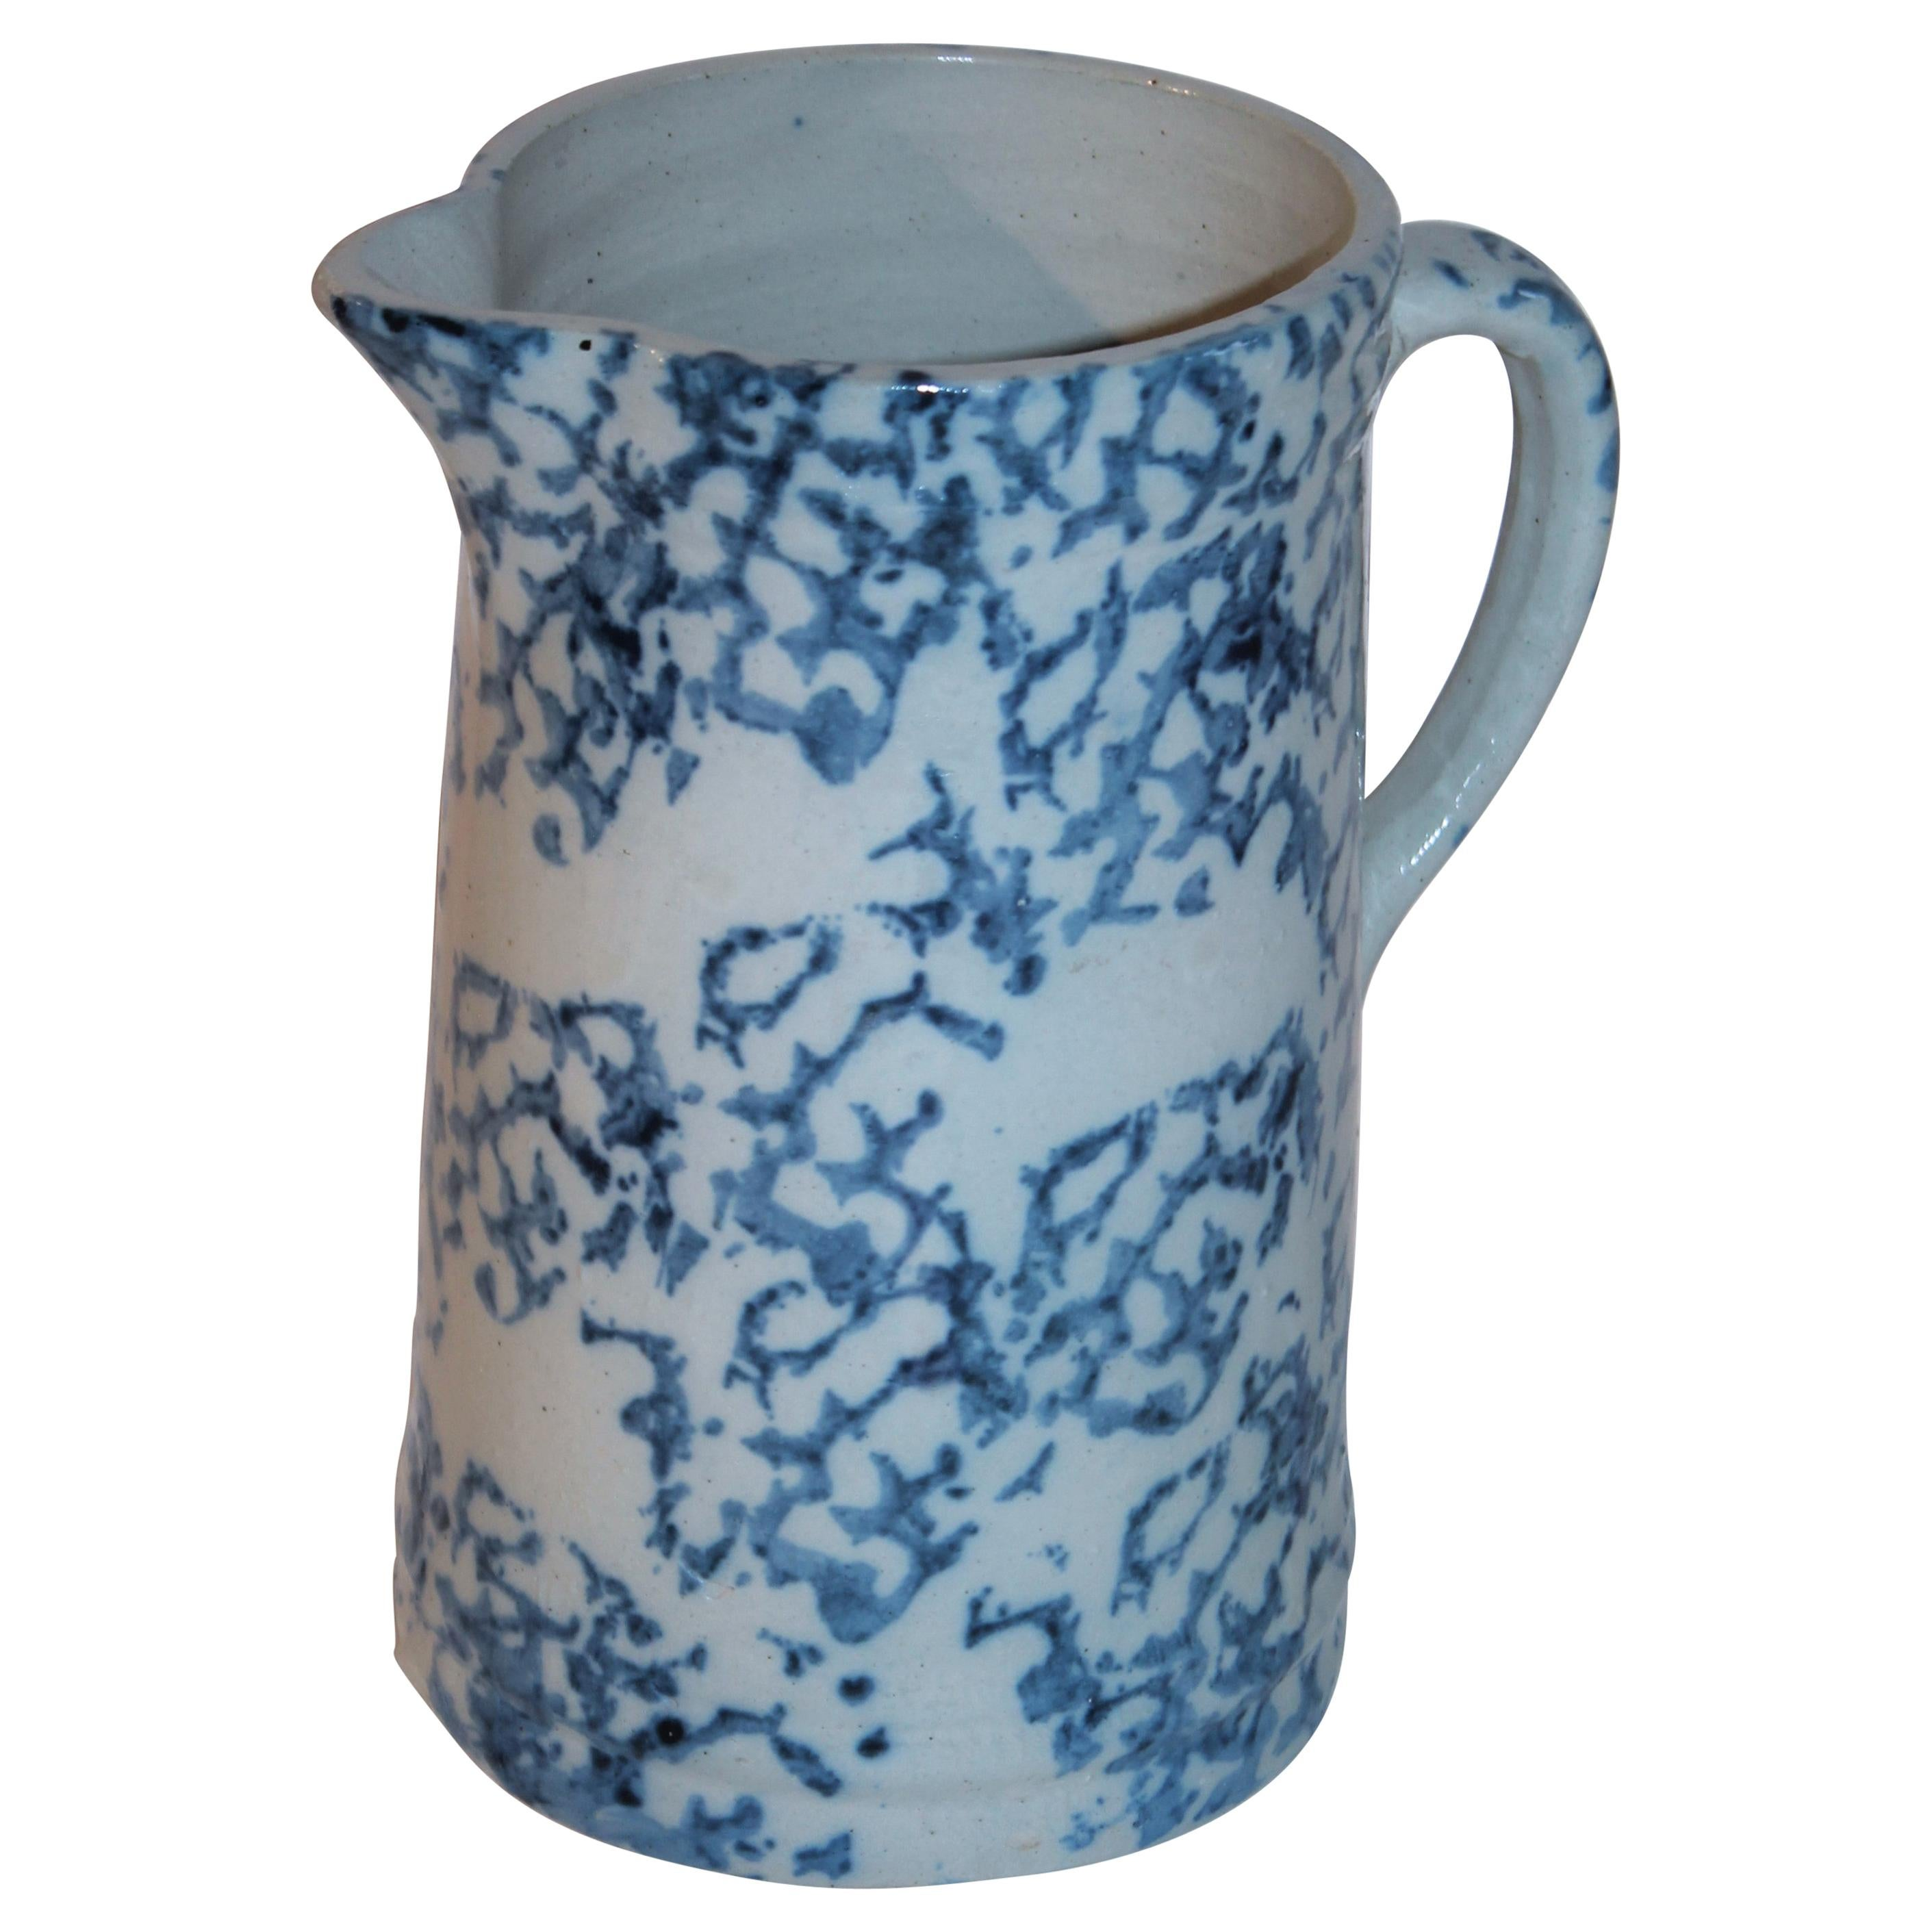 19thc Sponge Ware Pottery Pitcher